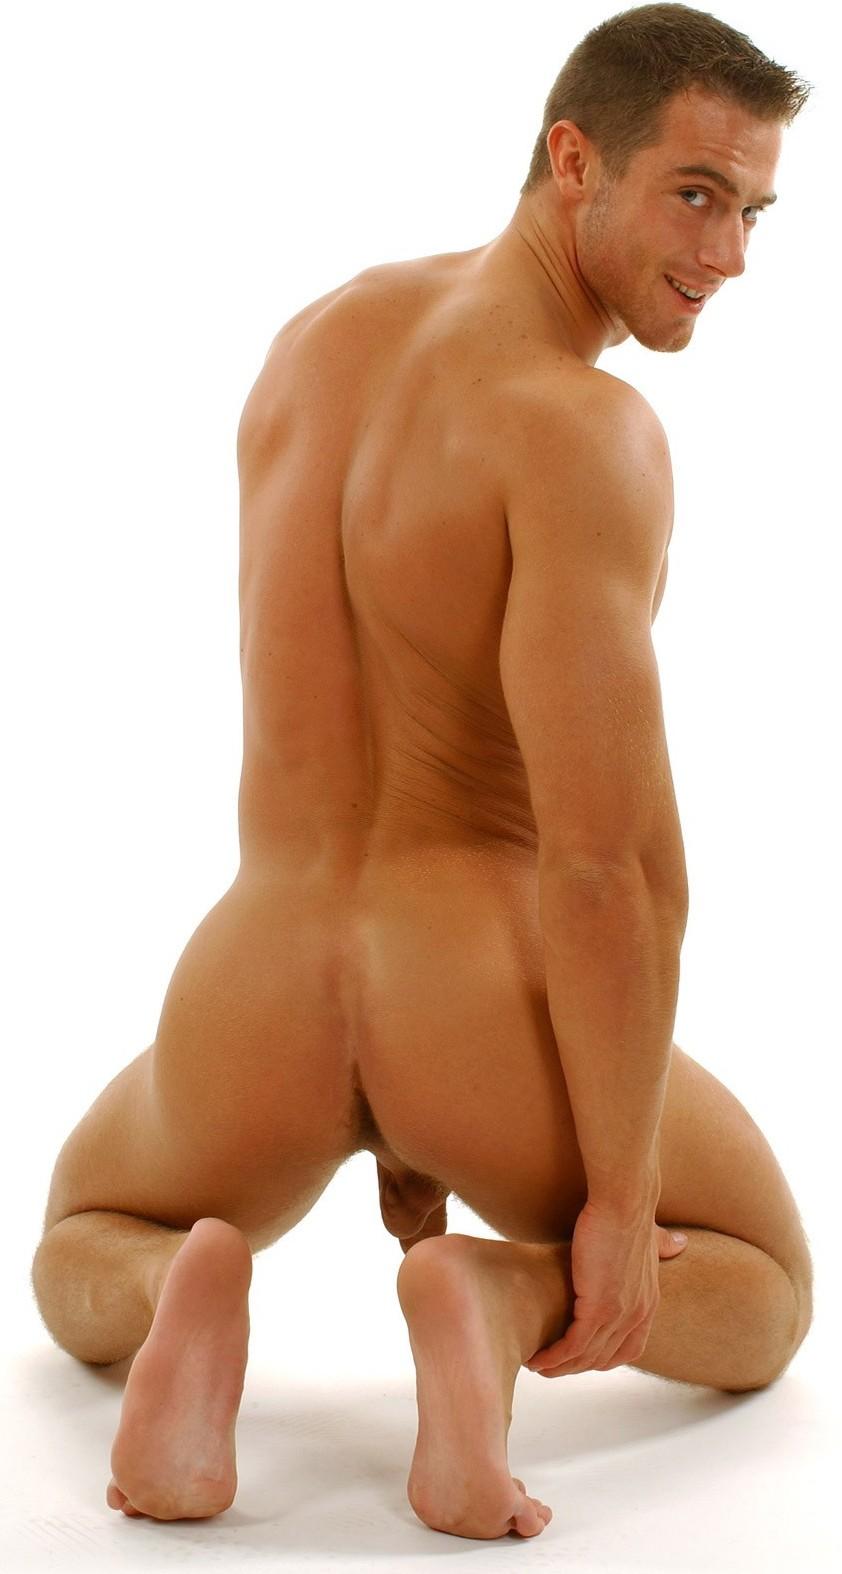 Pavel novotny porn straight